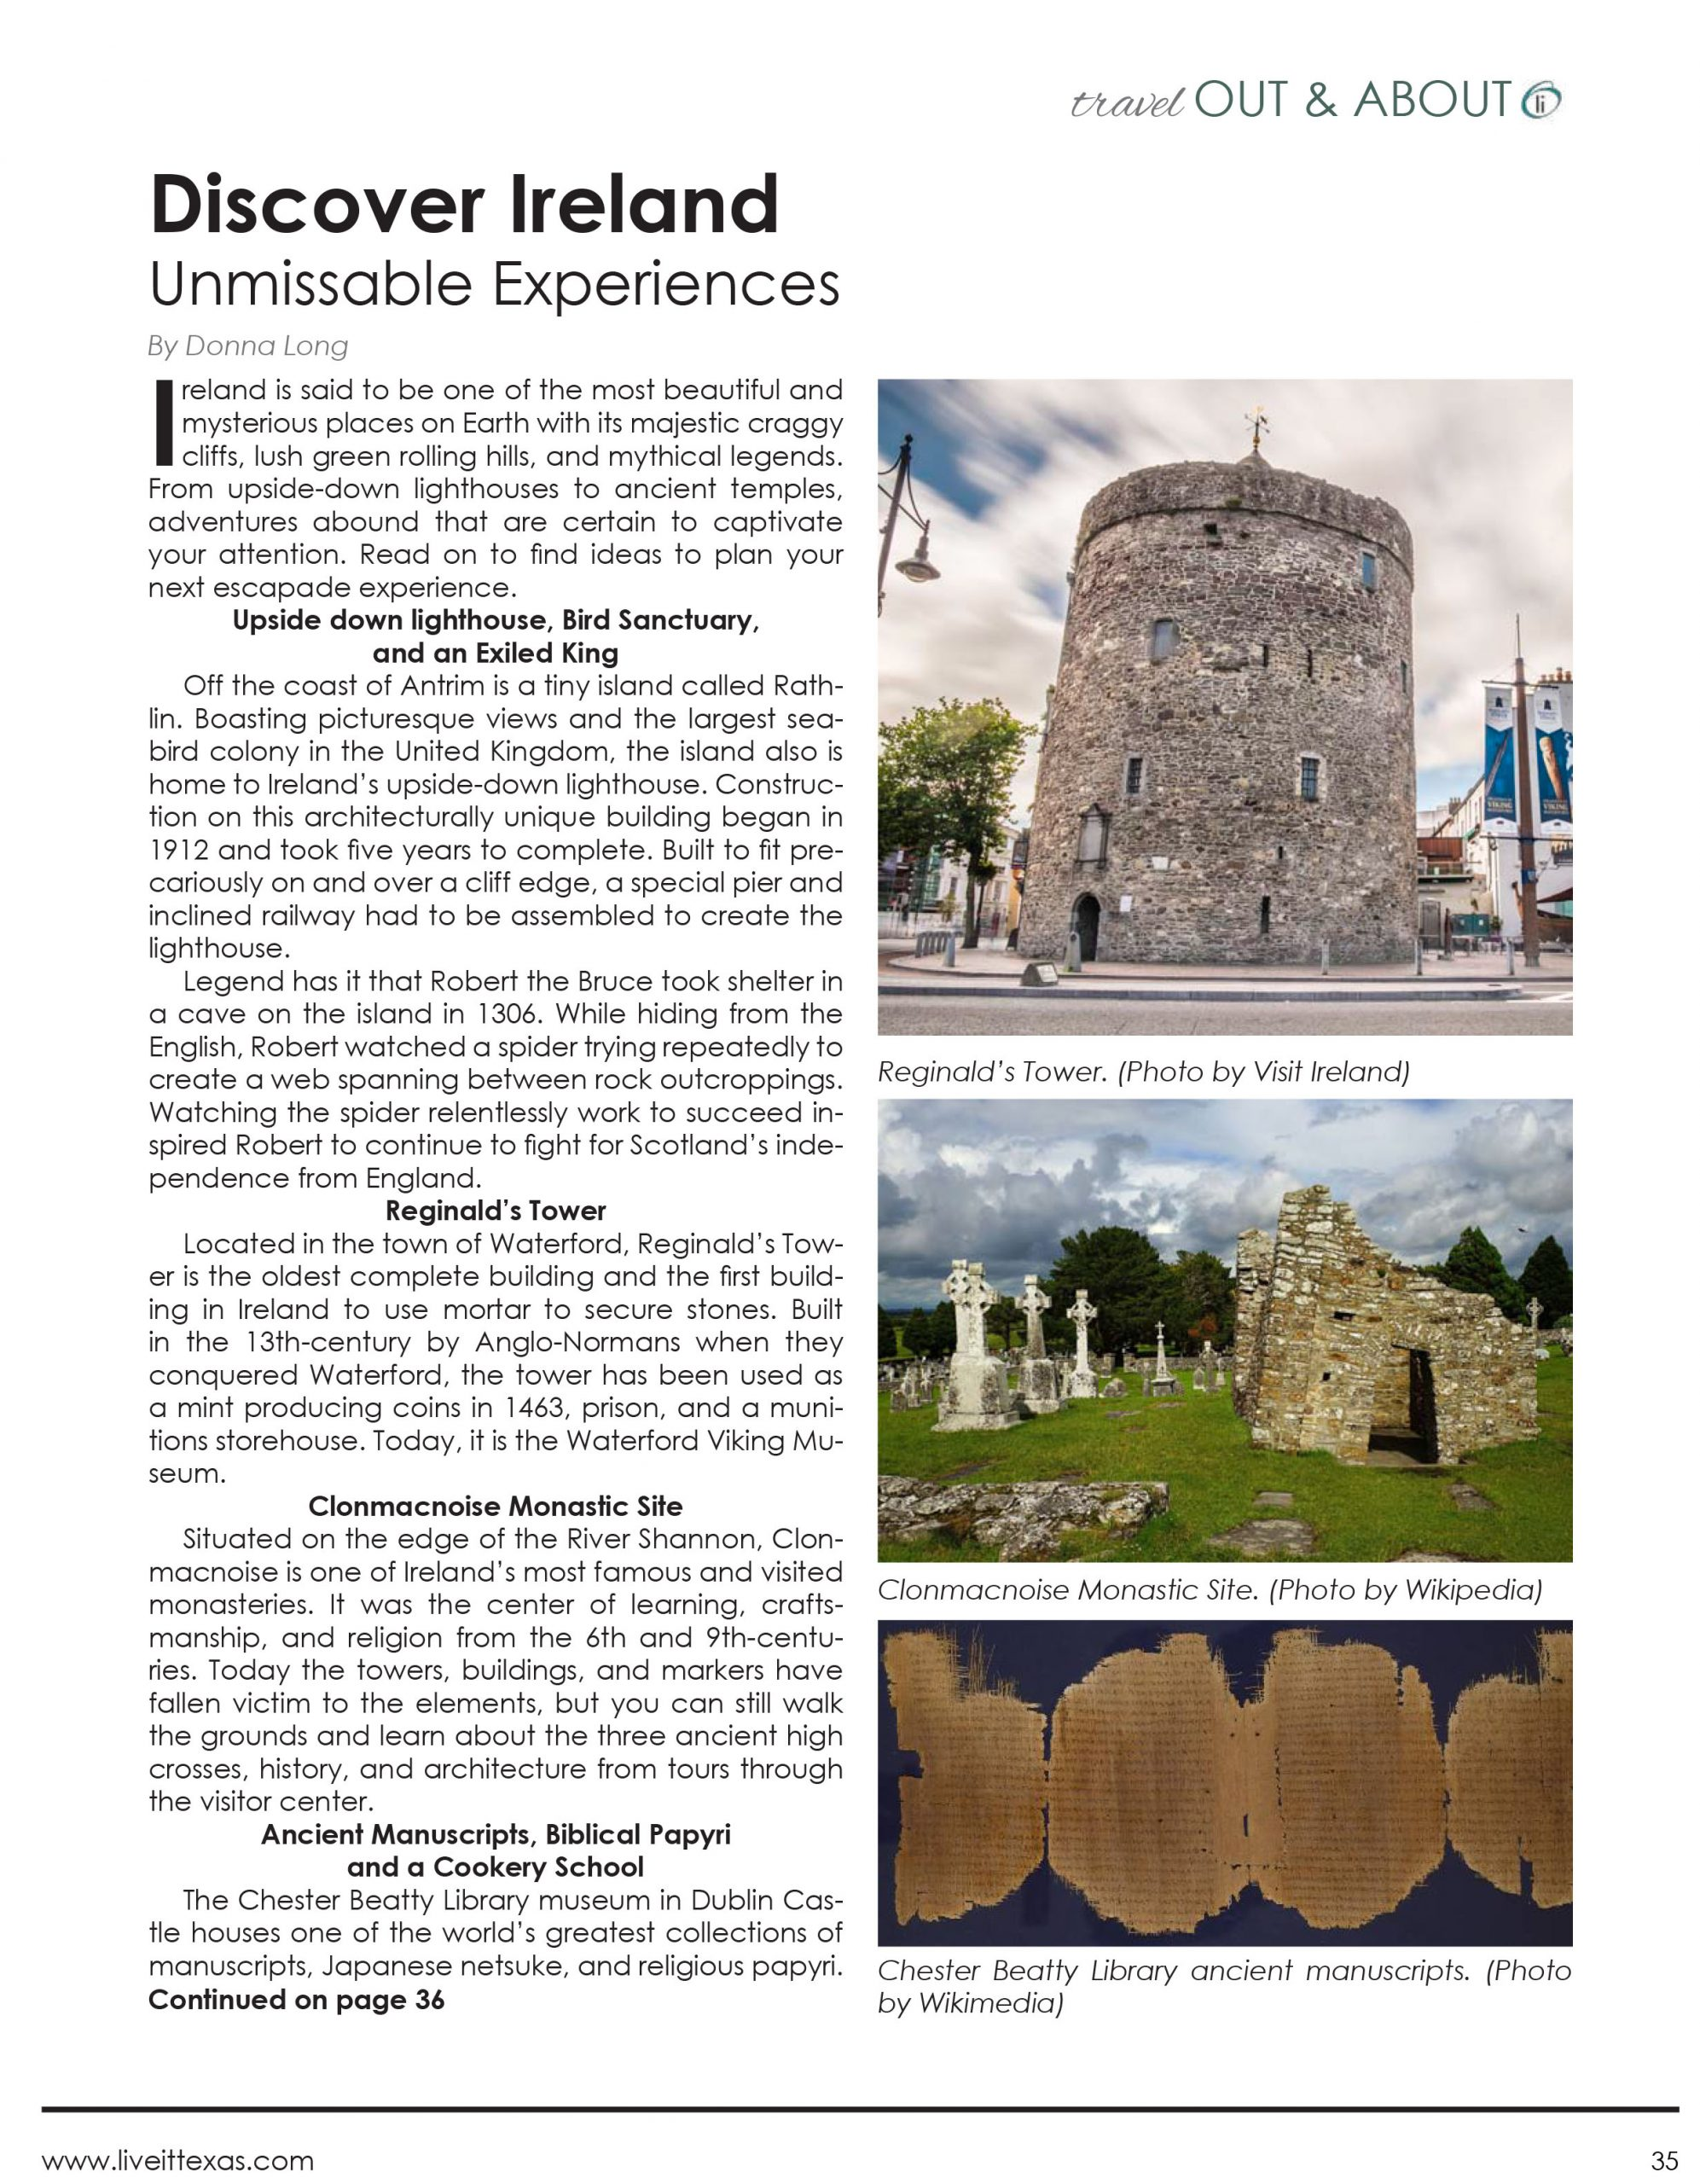 Discover Ireland: Unmissable Experiences – LiveIt Texas